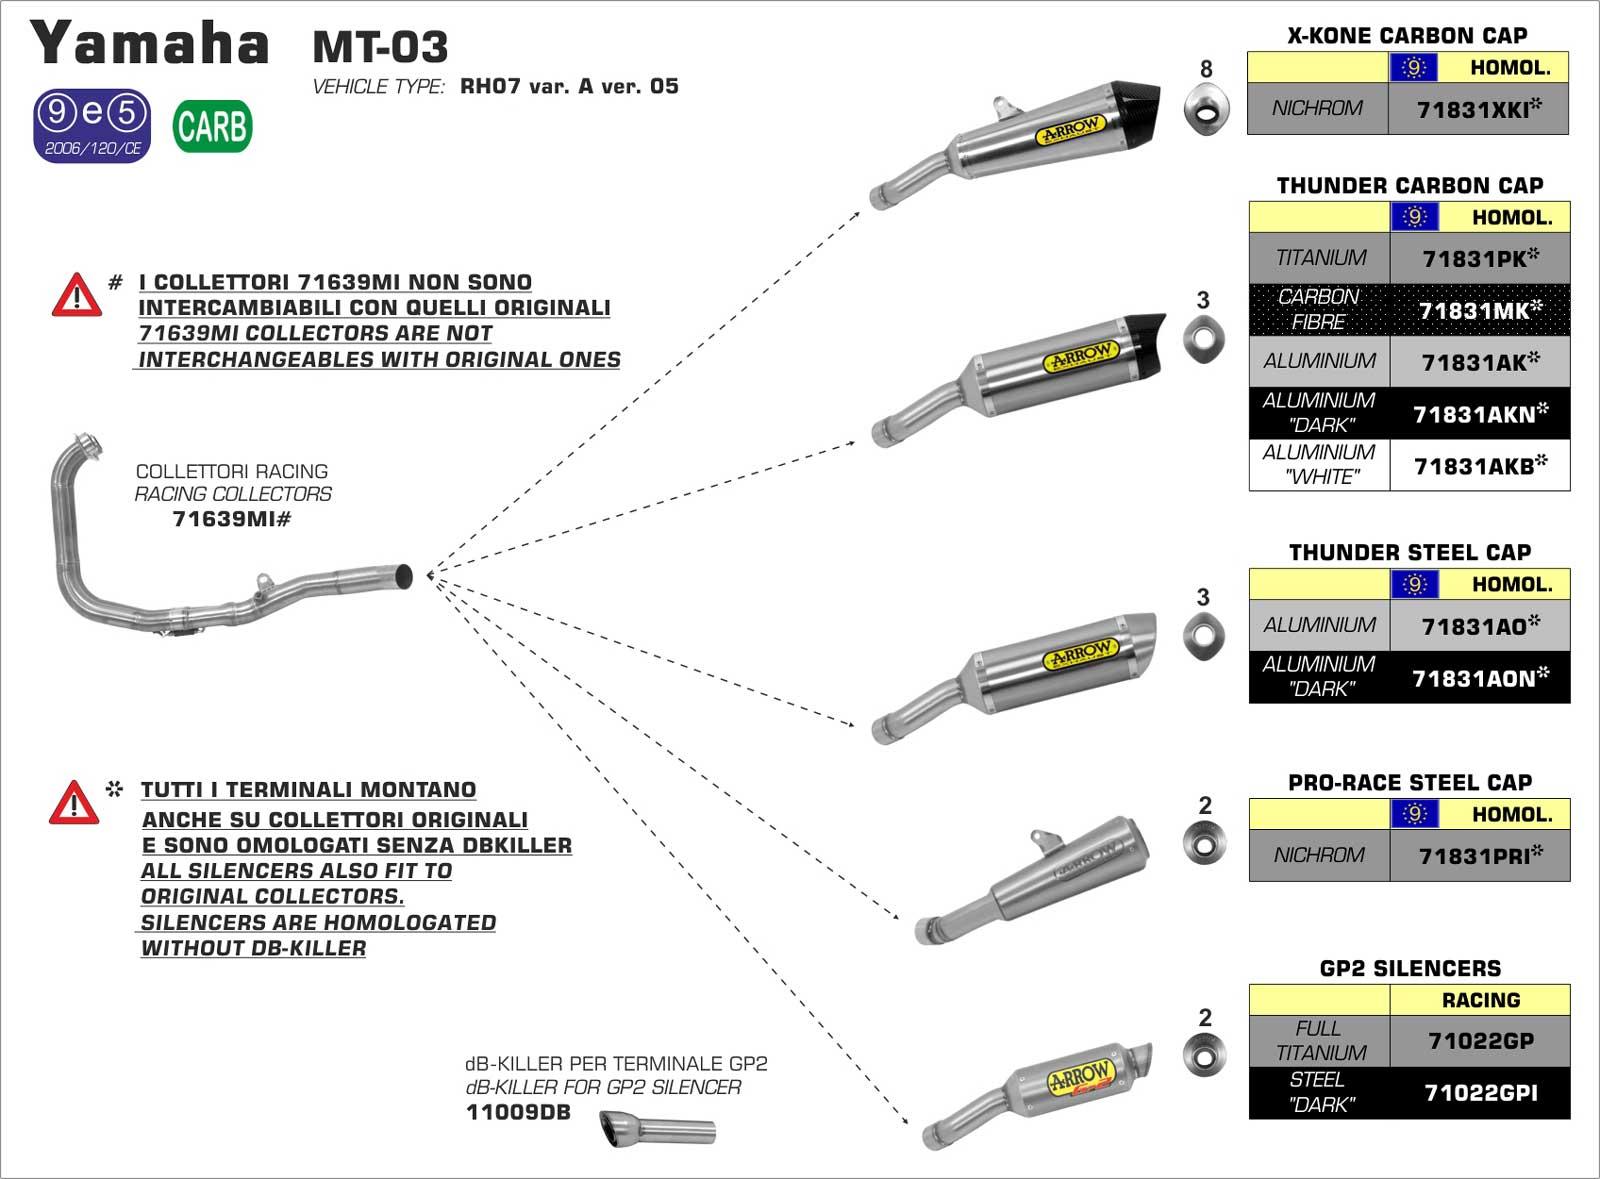 Schema Elettrico Yamaha Mt 03 : Em lineamoto arrow aon